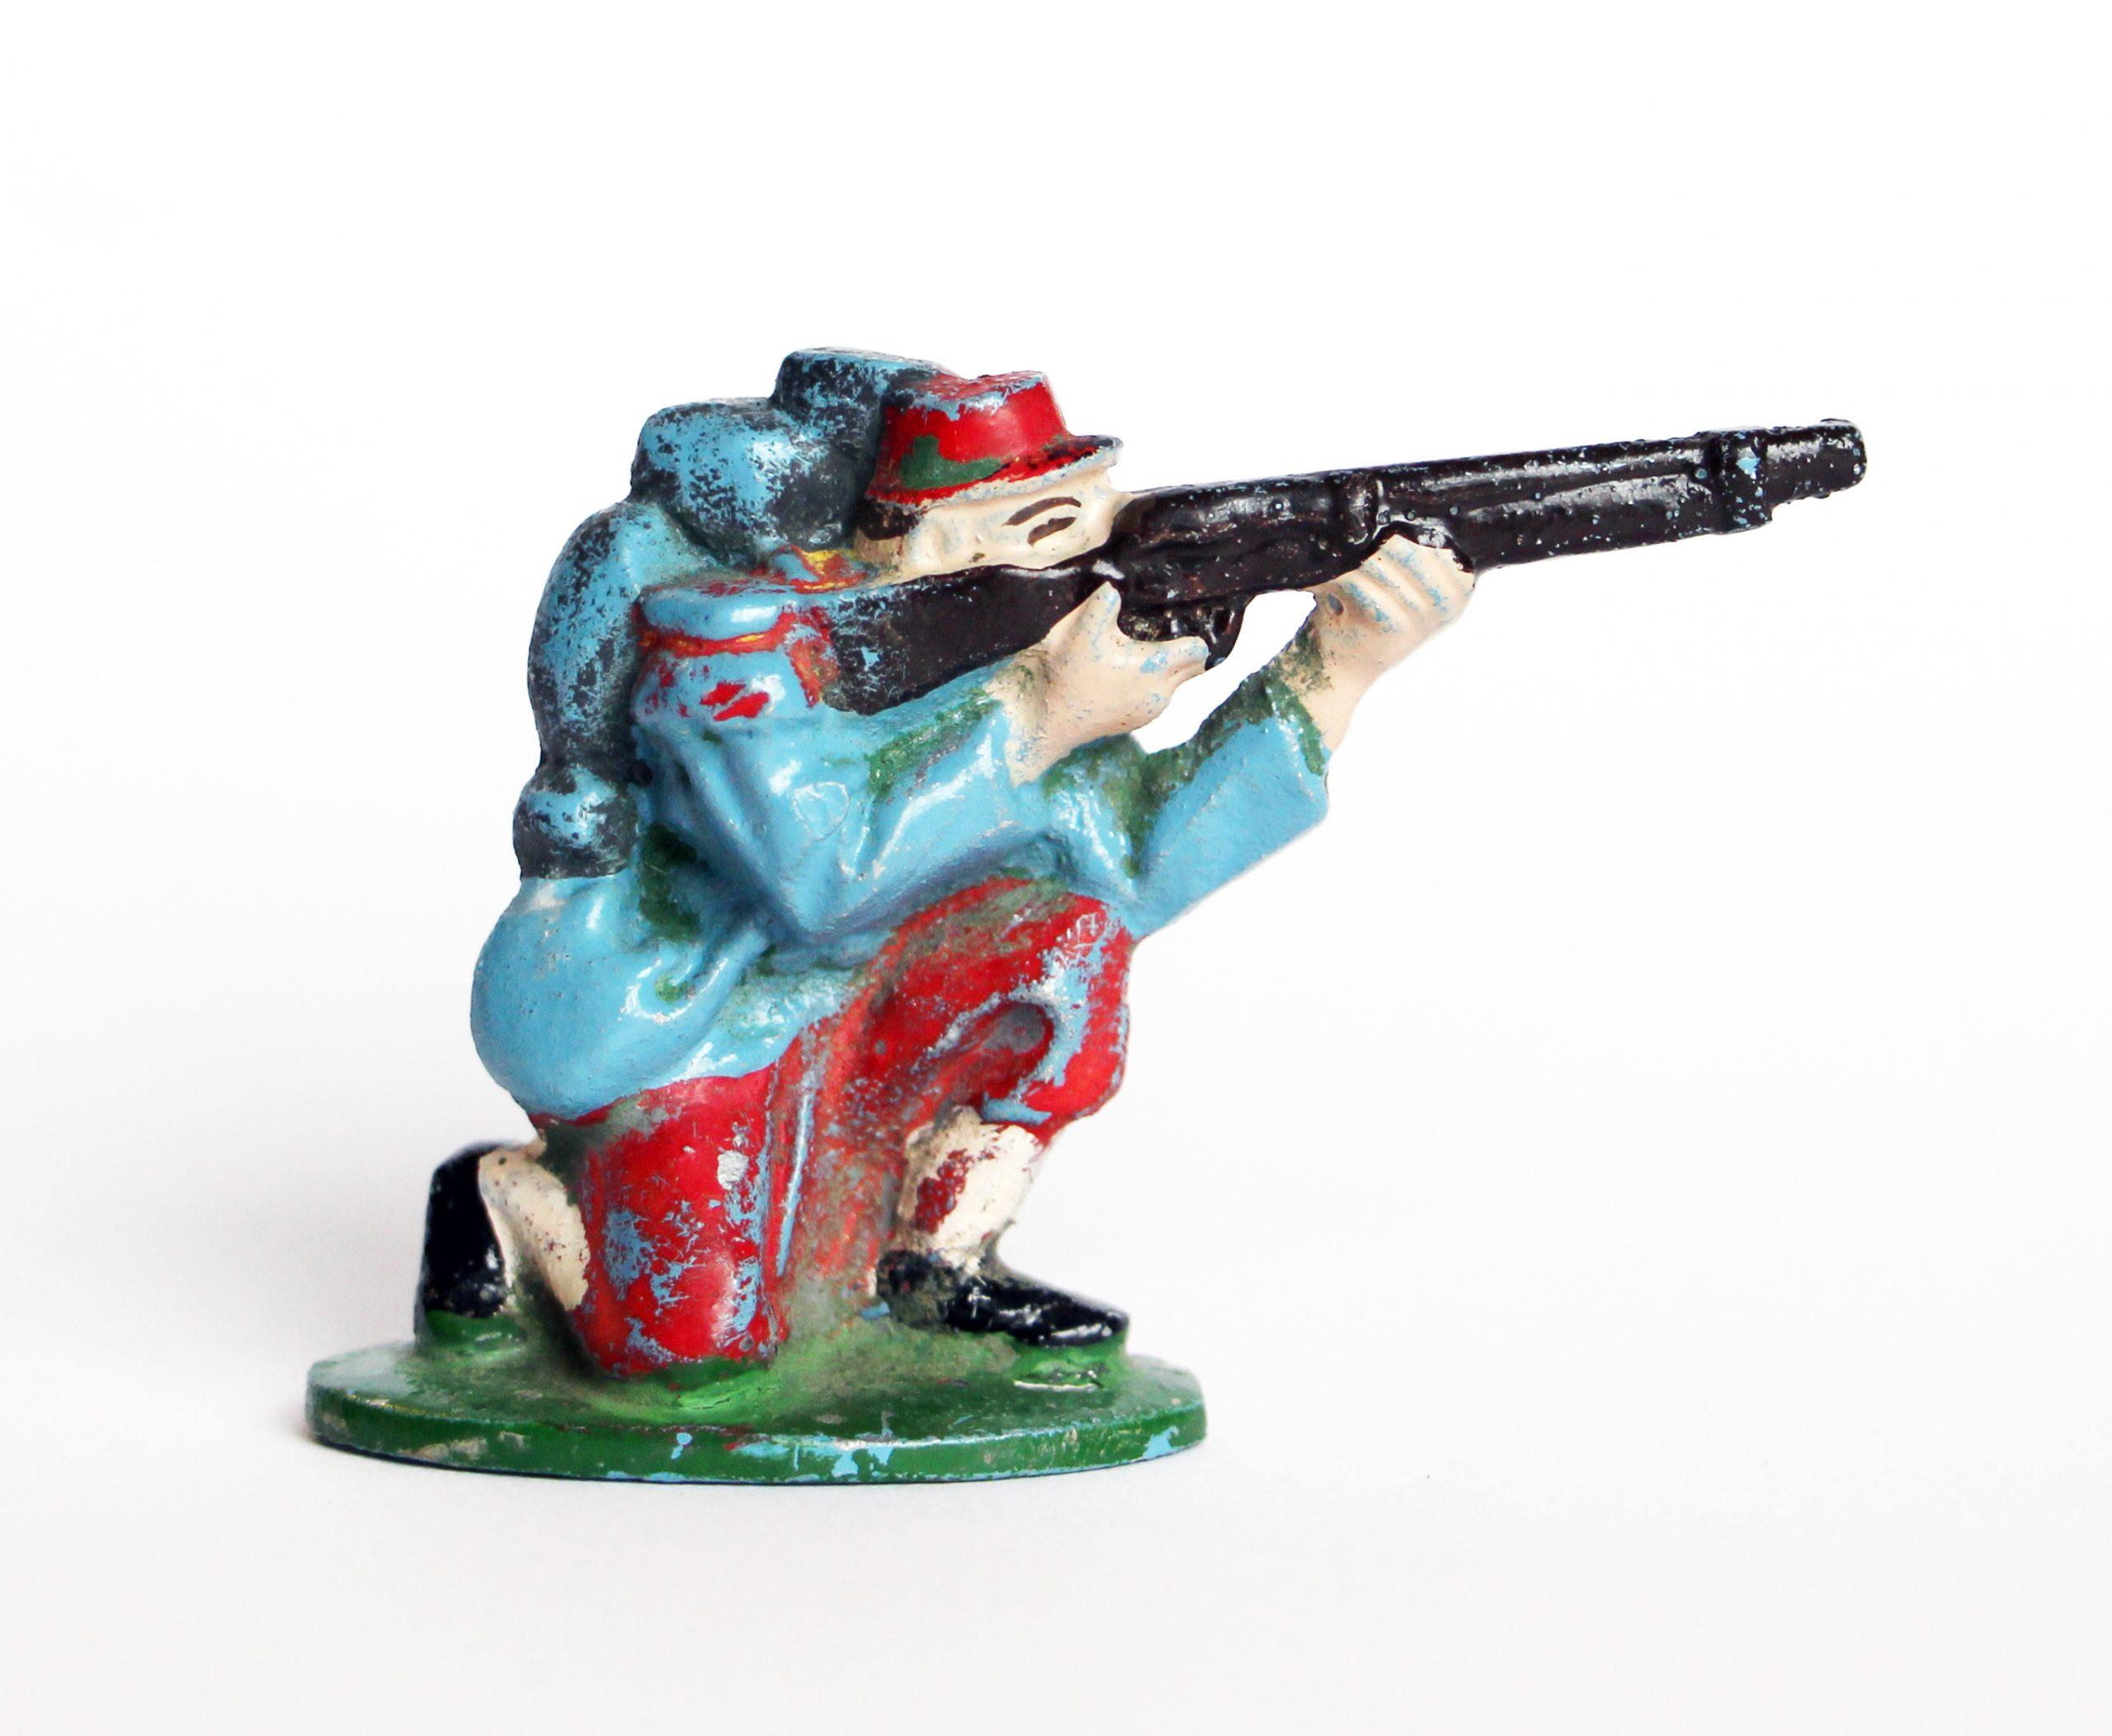 Figurine Quiralu Infanterie 1870 - Guerre 1870 - Série rare